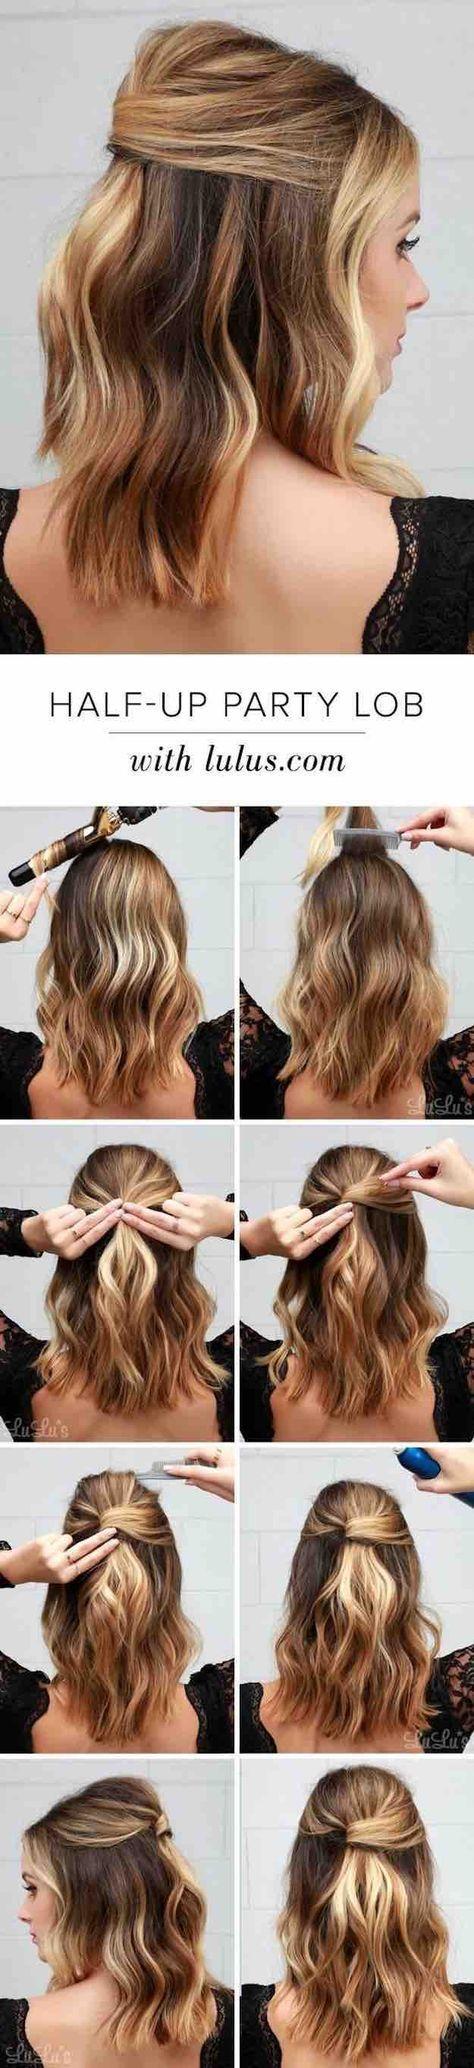 41 Lob Haircut Ideas For Women Lulus How To Half Up Party Lob What Is A Lob Step By Step Easy Tuto Hair Styles Long Hair Styles Medium Length Hair Styles